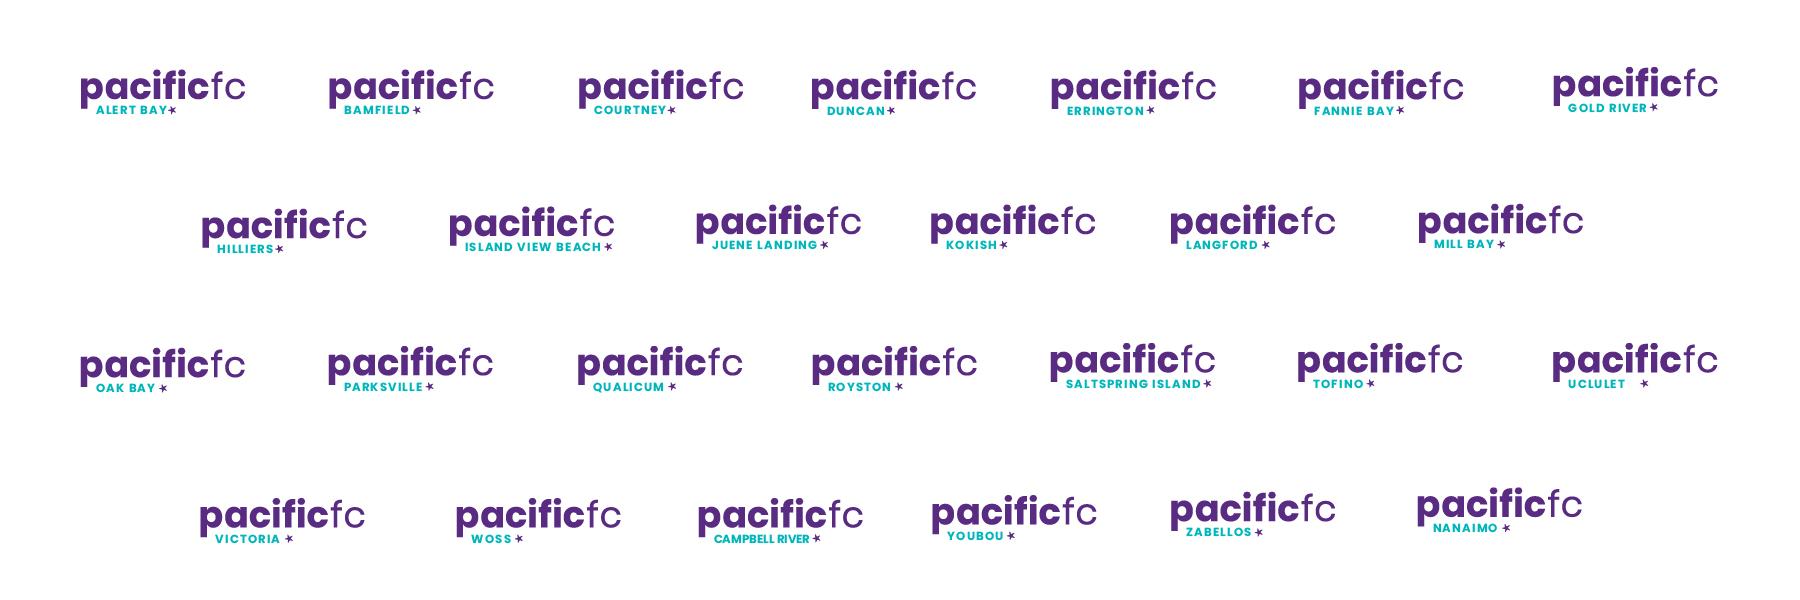 PFC-Cities-1800x600px